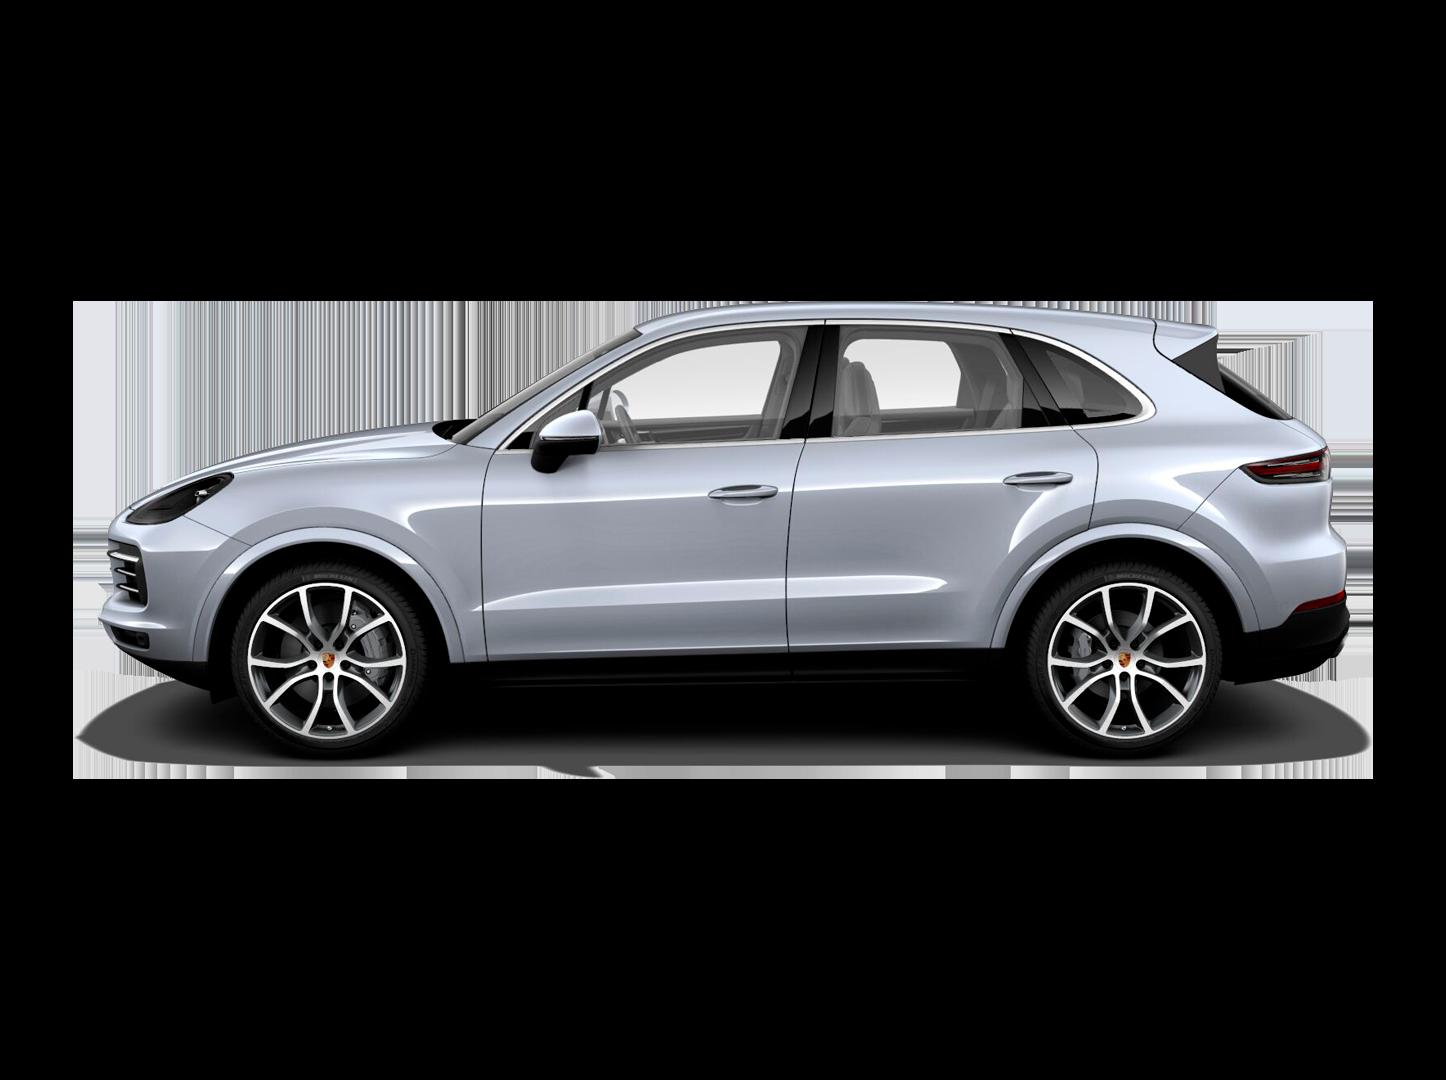 3.0 V6 GASOLINA S AWD TIPTRONIC S